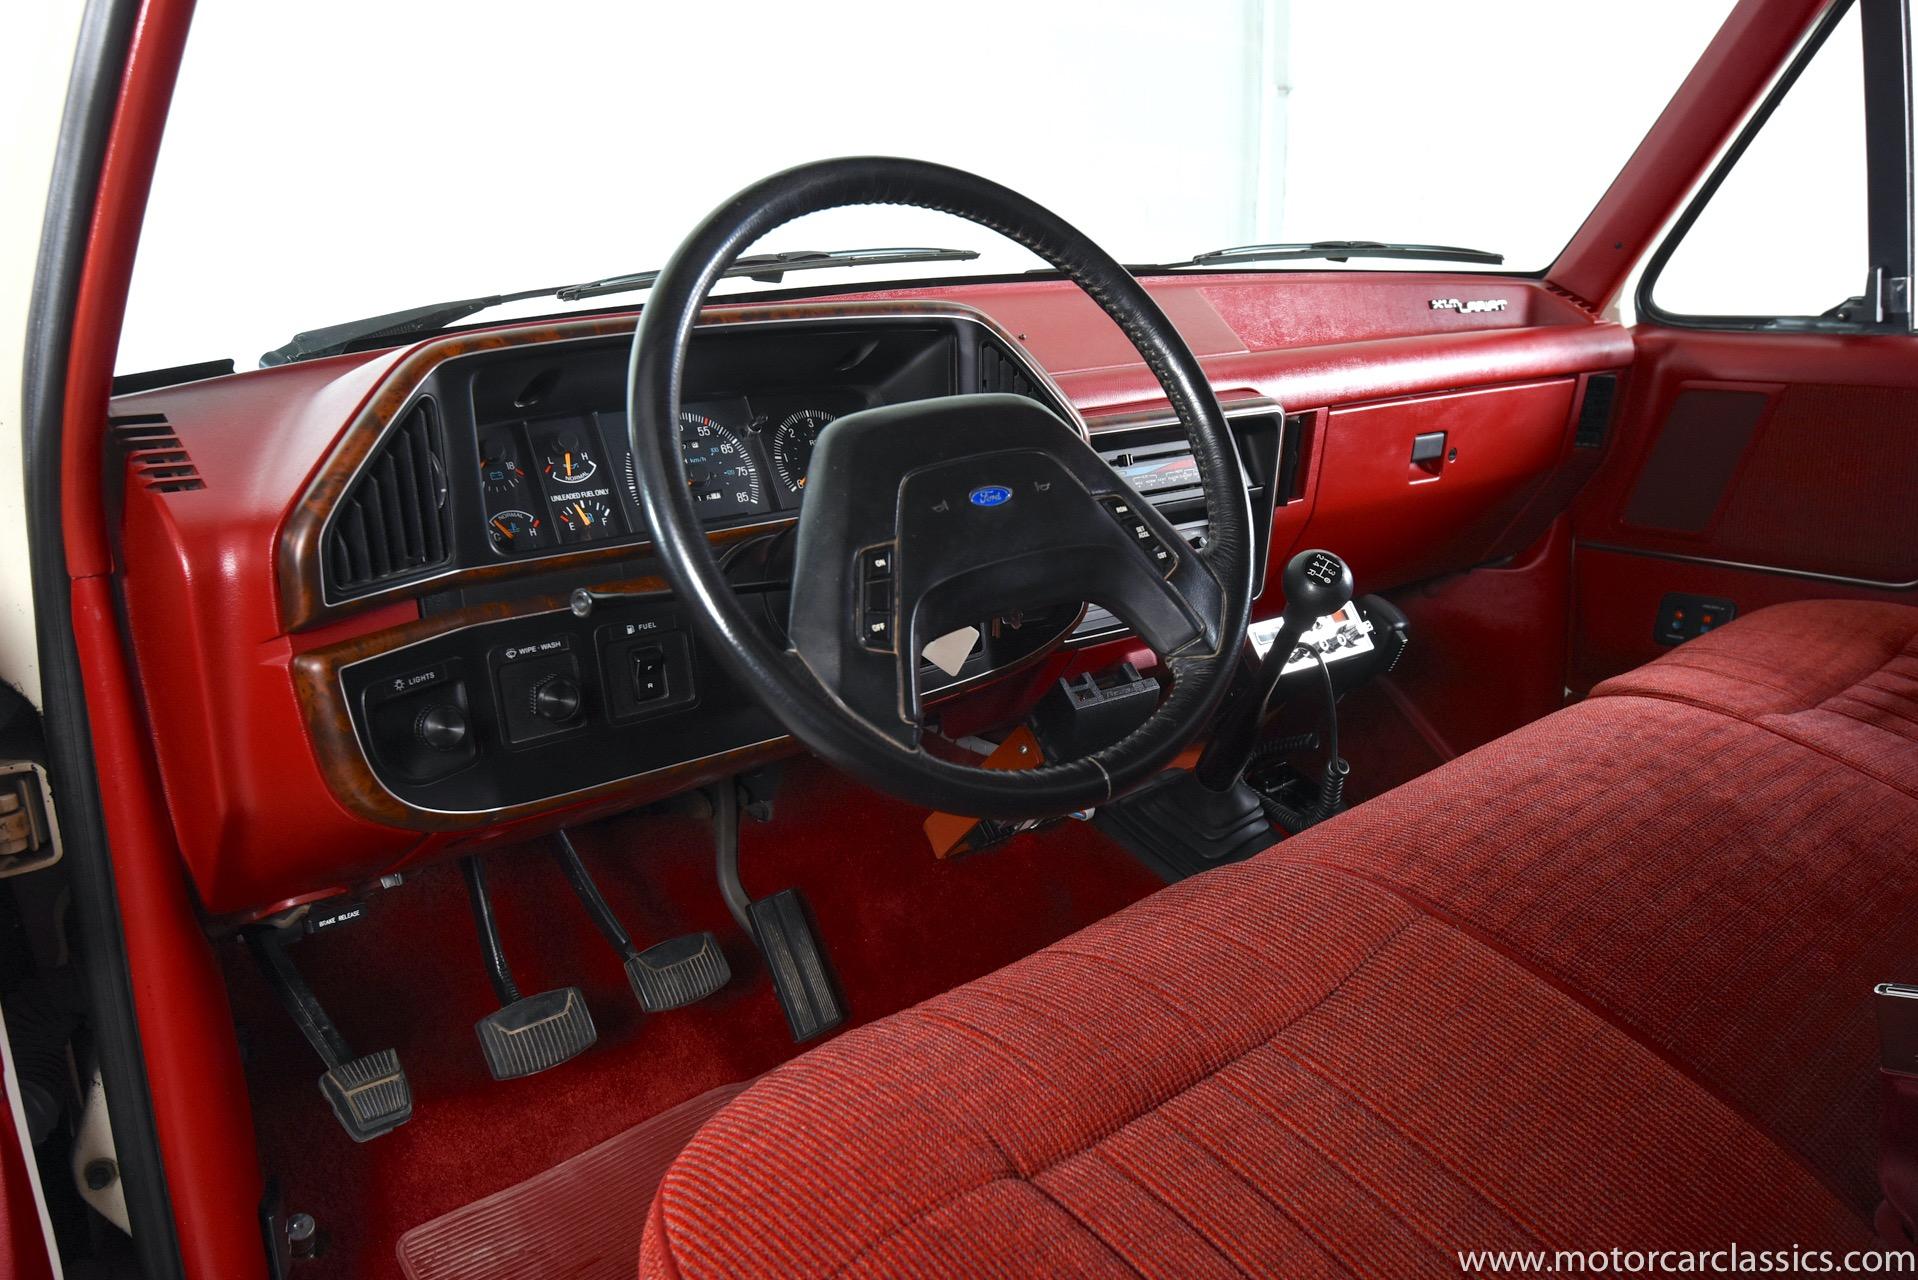 1990 Ford F-350 XLT Lariat